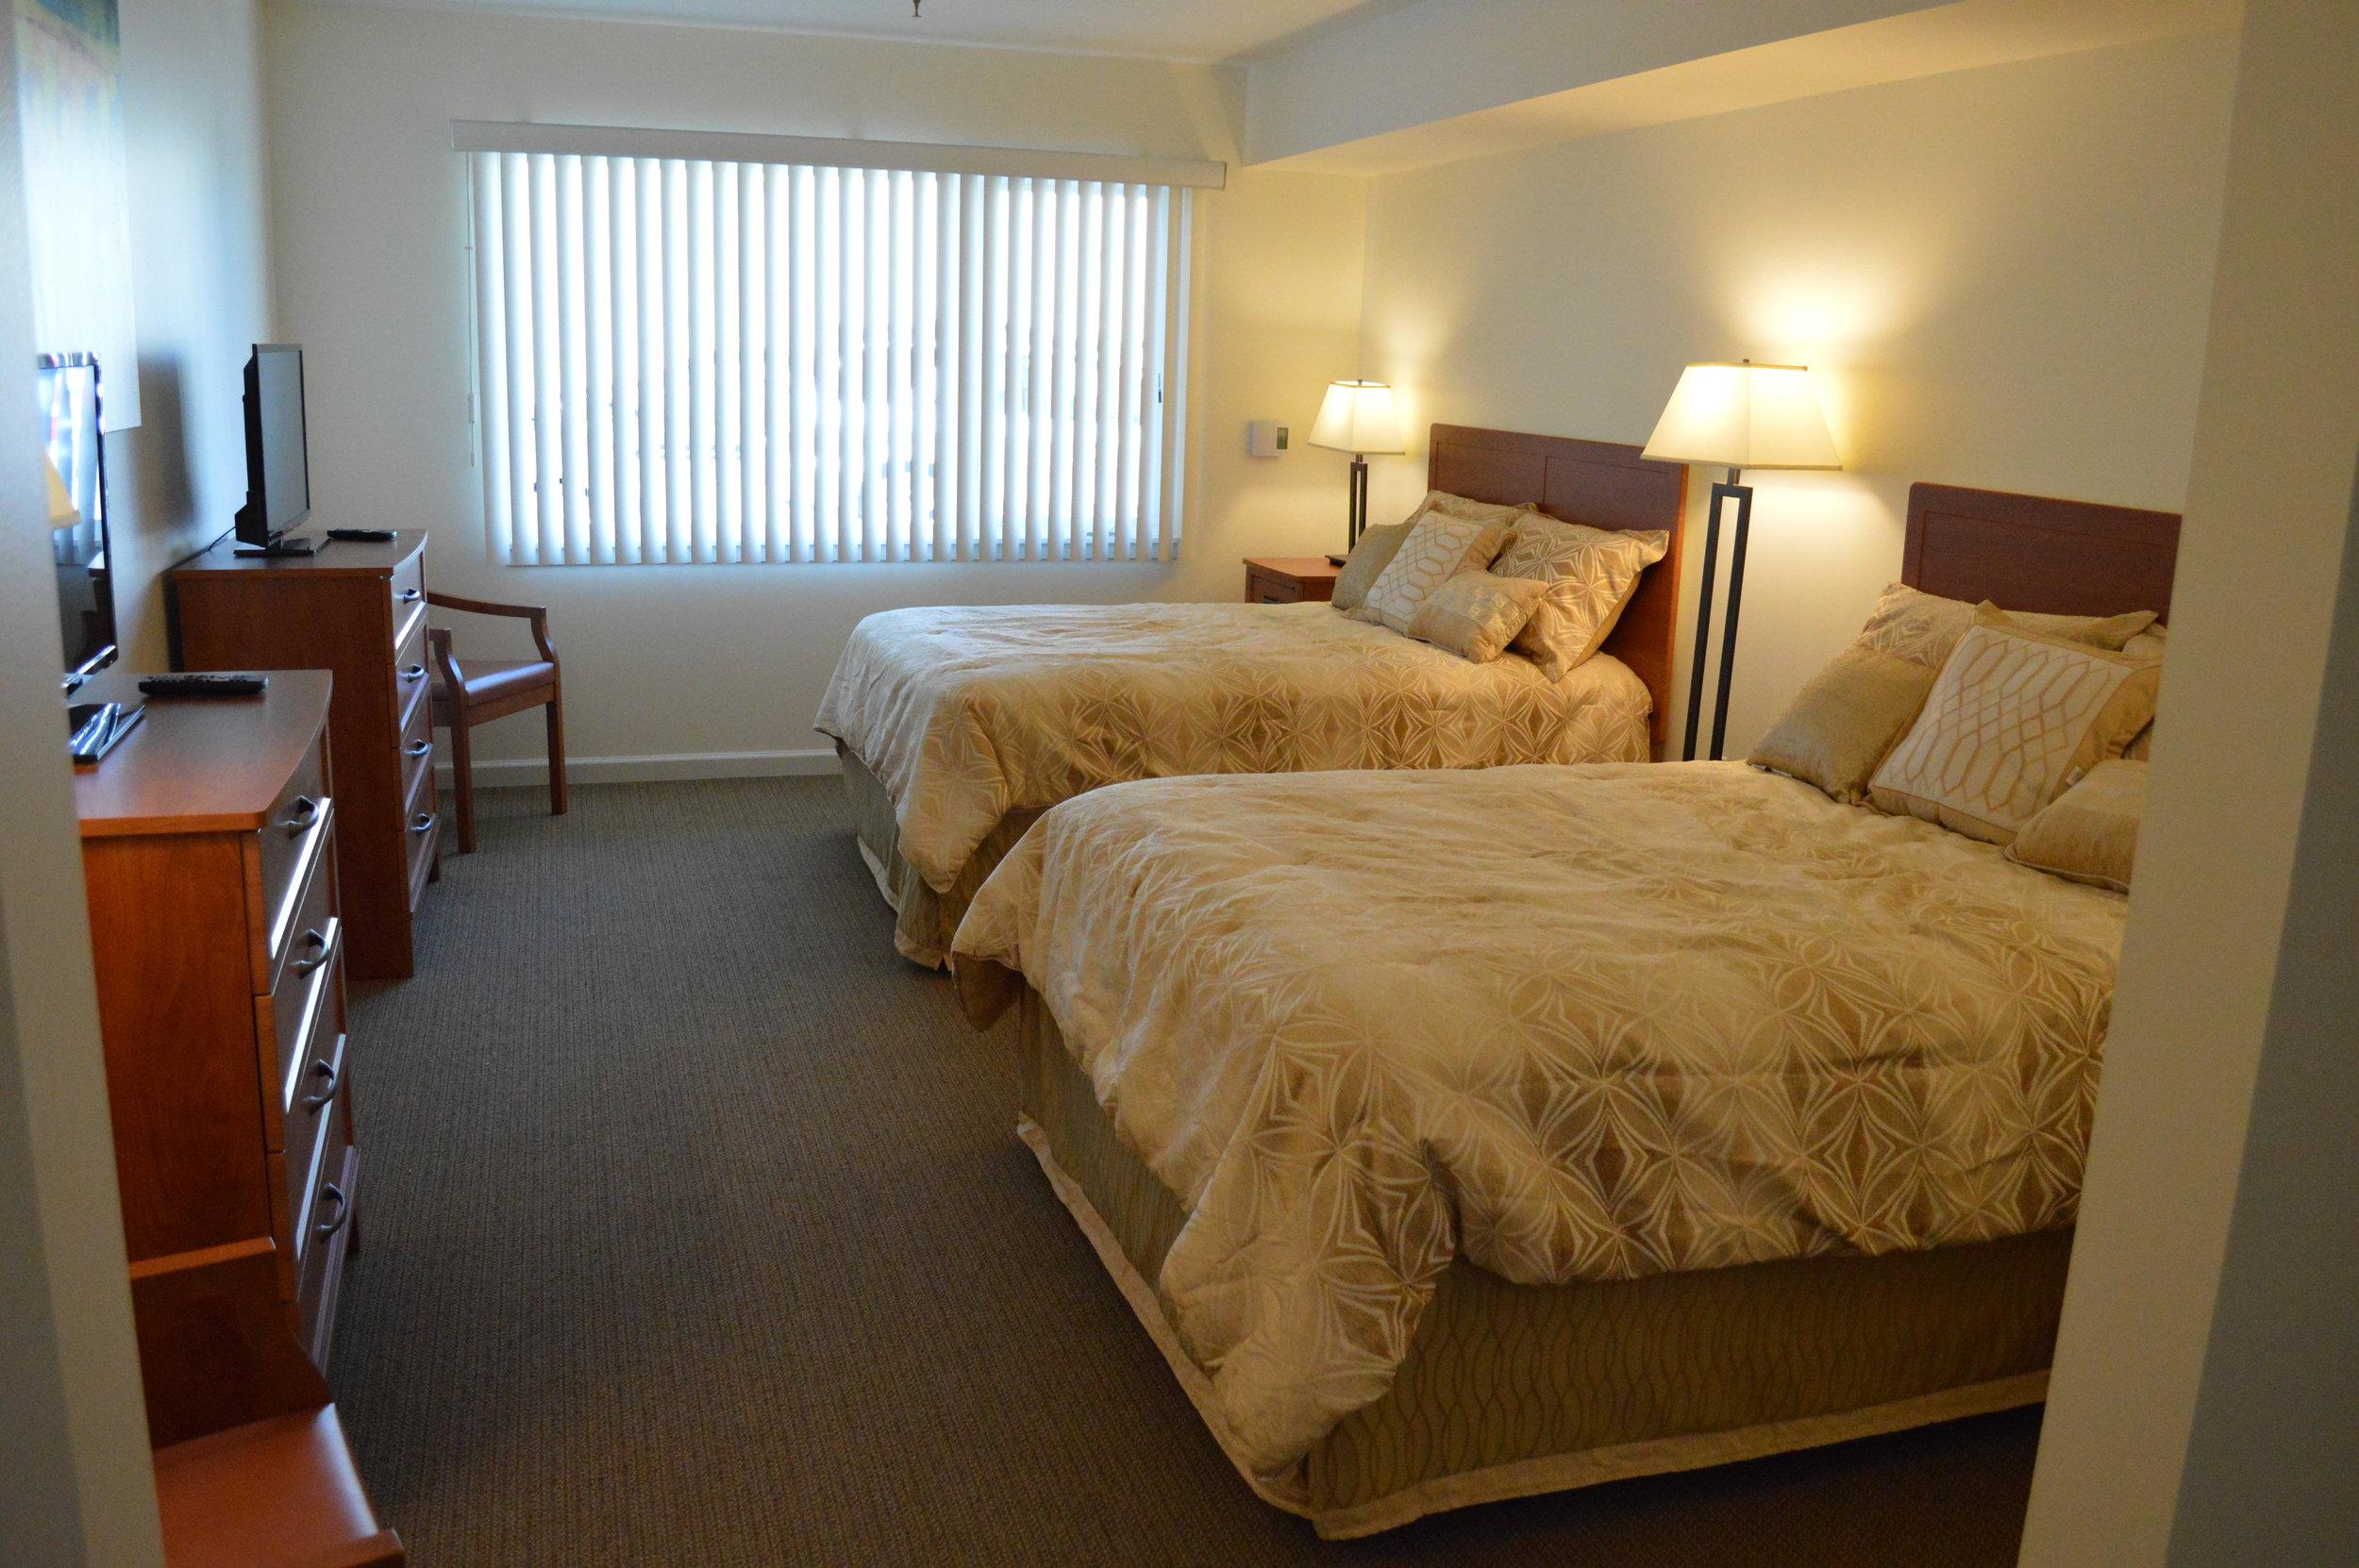 Pic of 2 bedroom at KSM.JPG